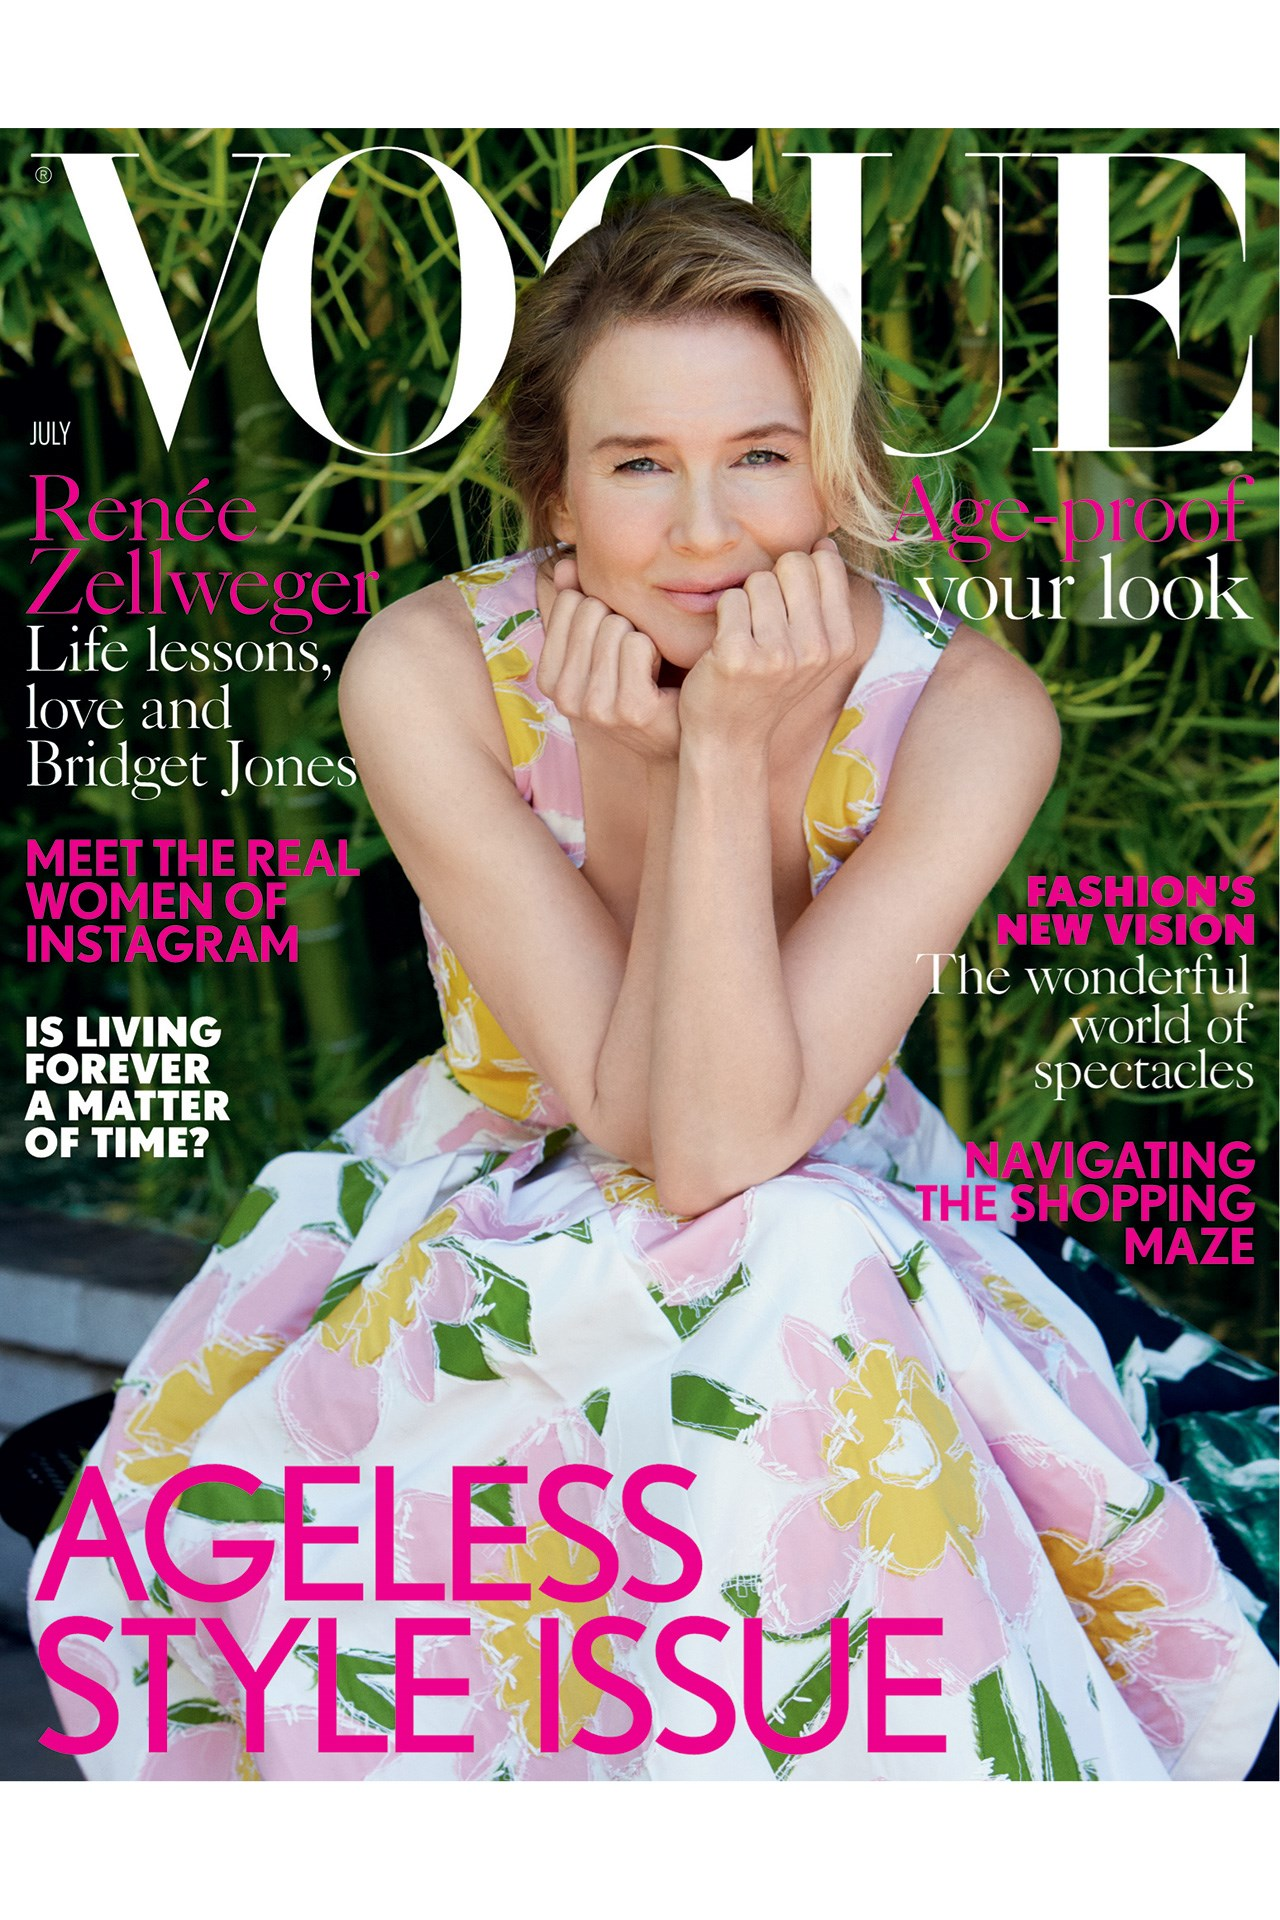 Vogue-July16-cover-vogue-02june16-print_b